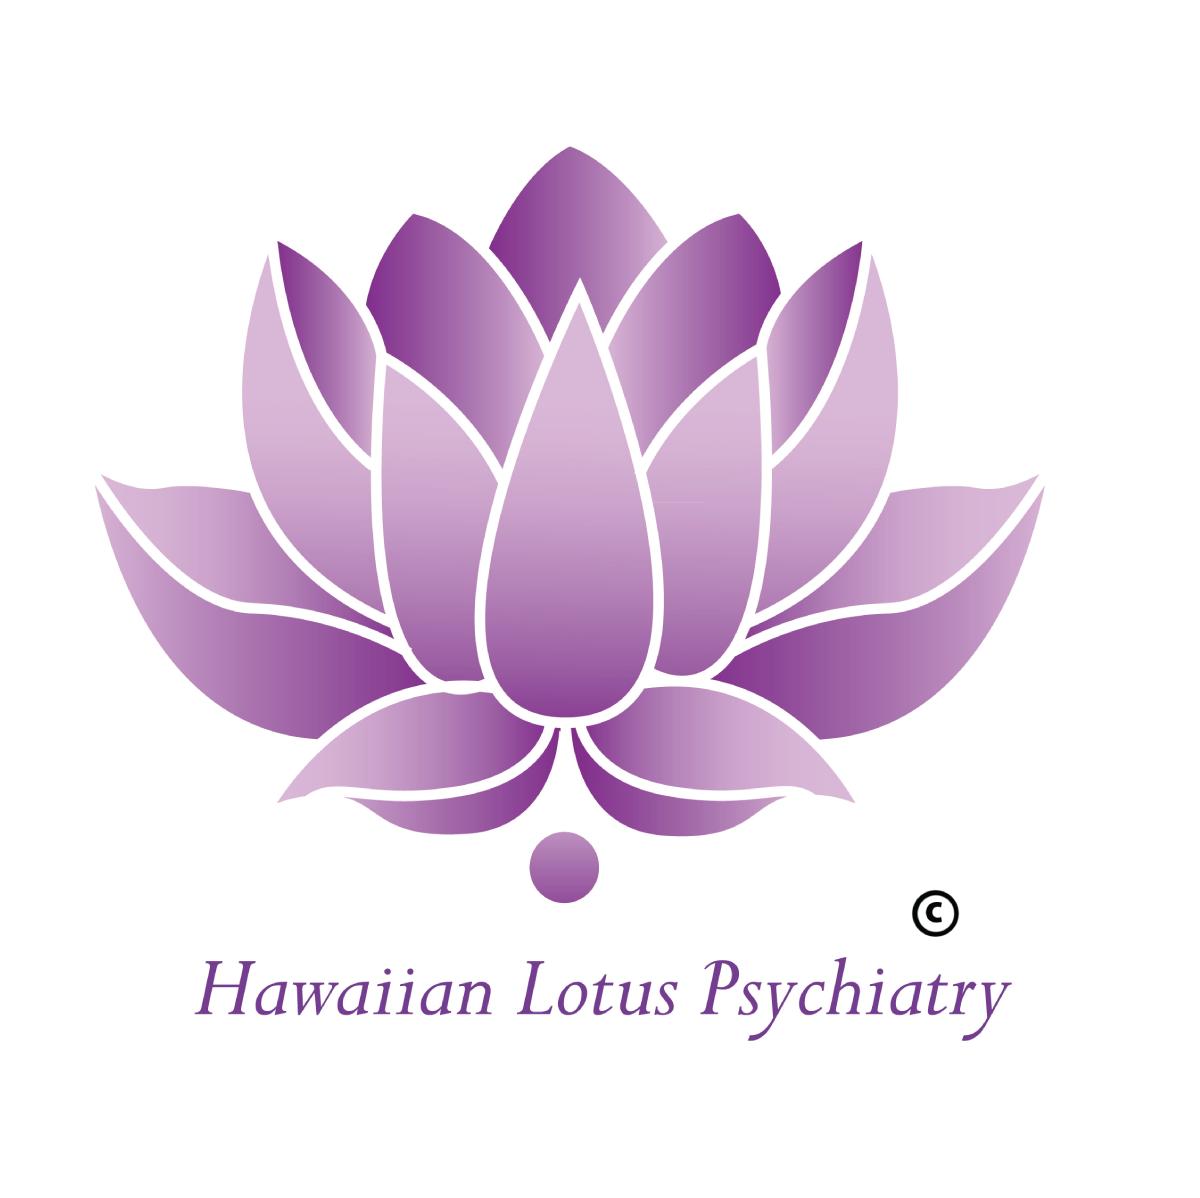 hawaiianLotusPsychiatry.png